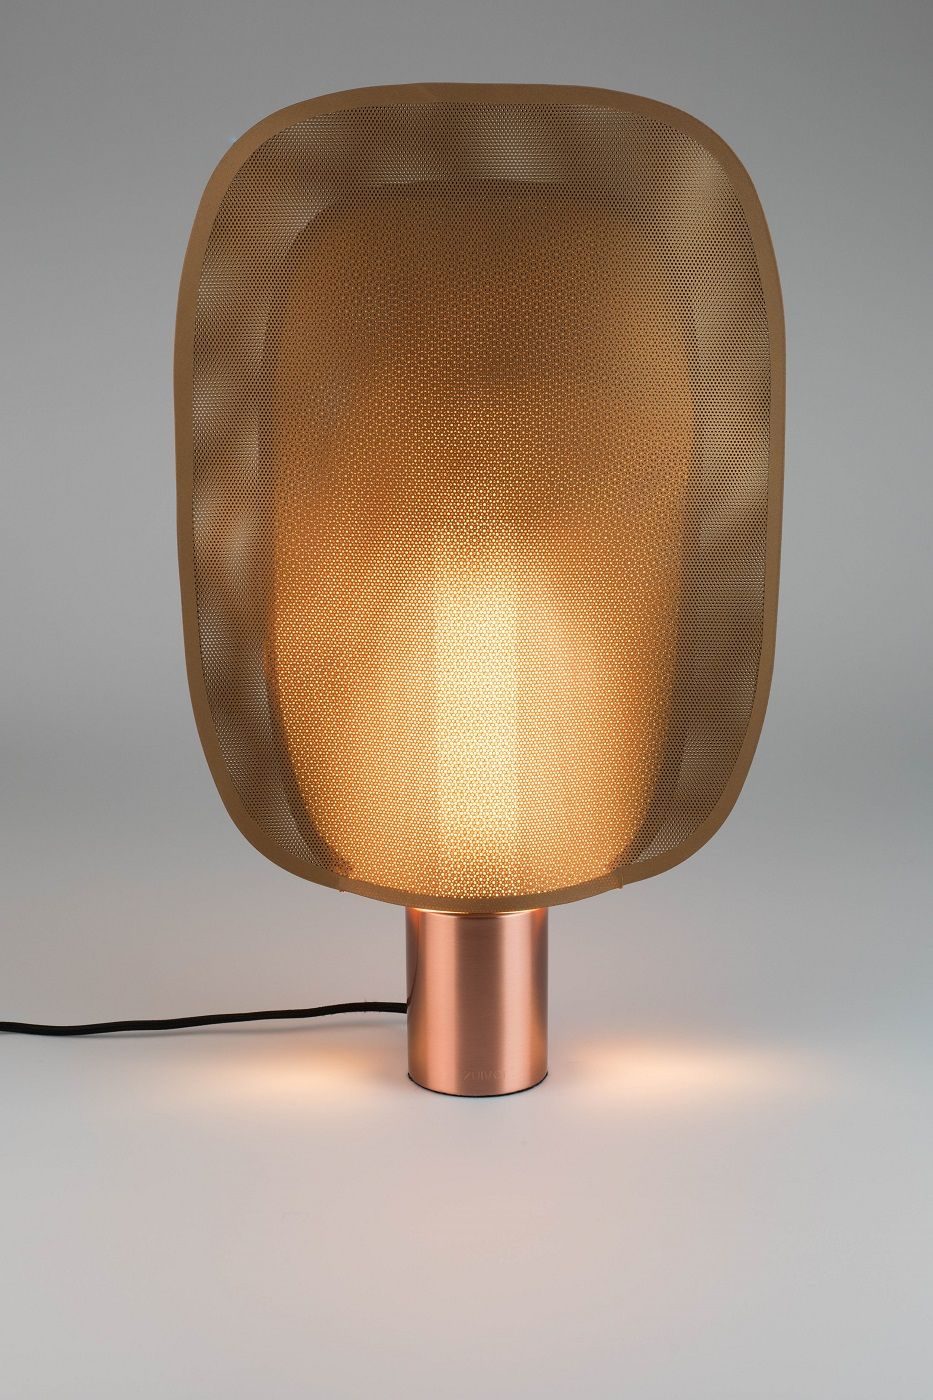 Zuiver Mai M Bordlampe - Kobber